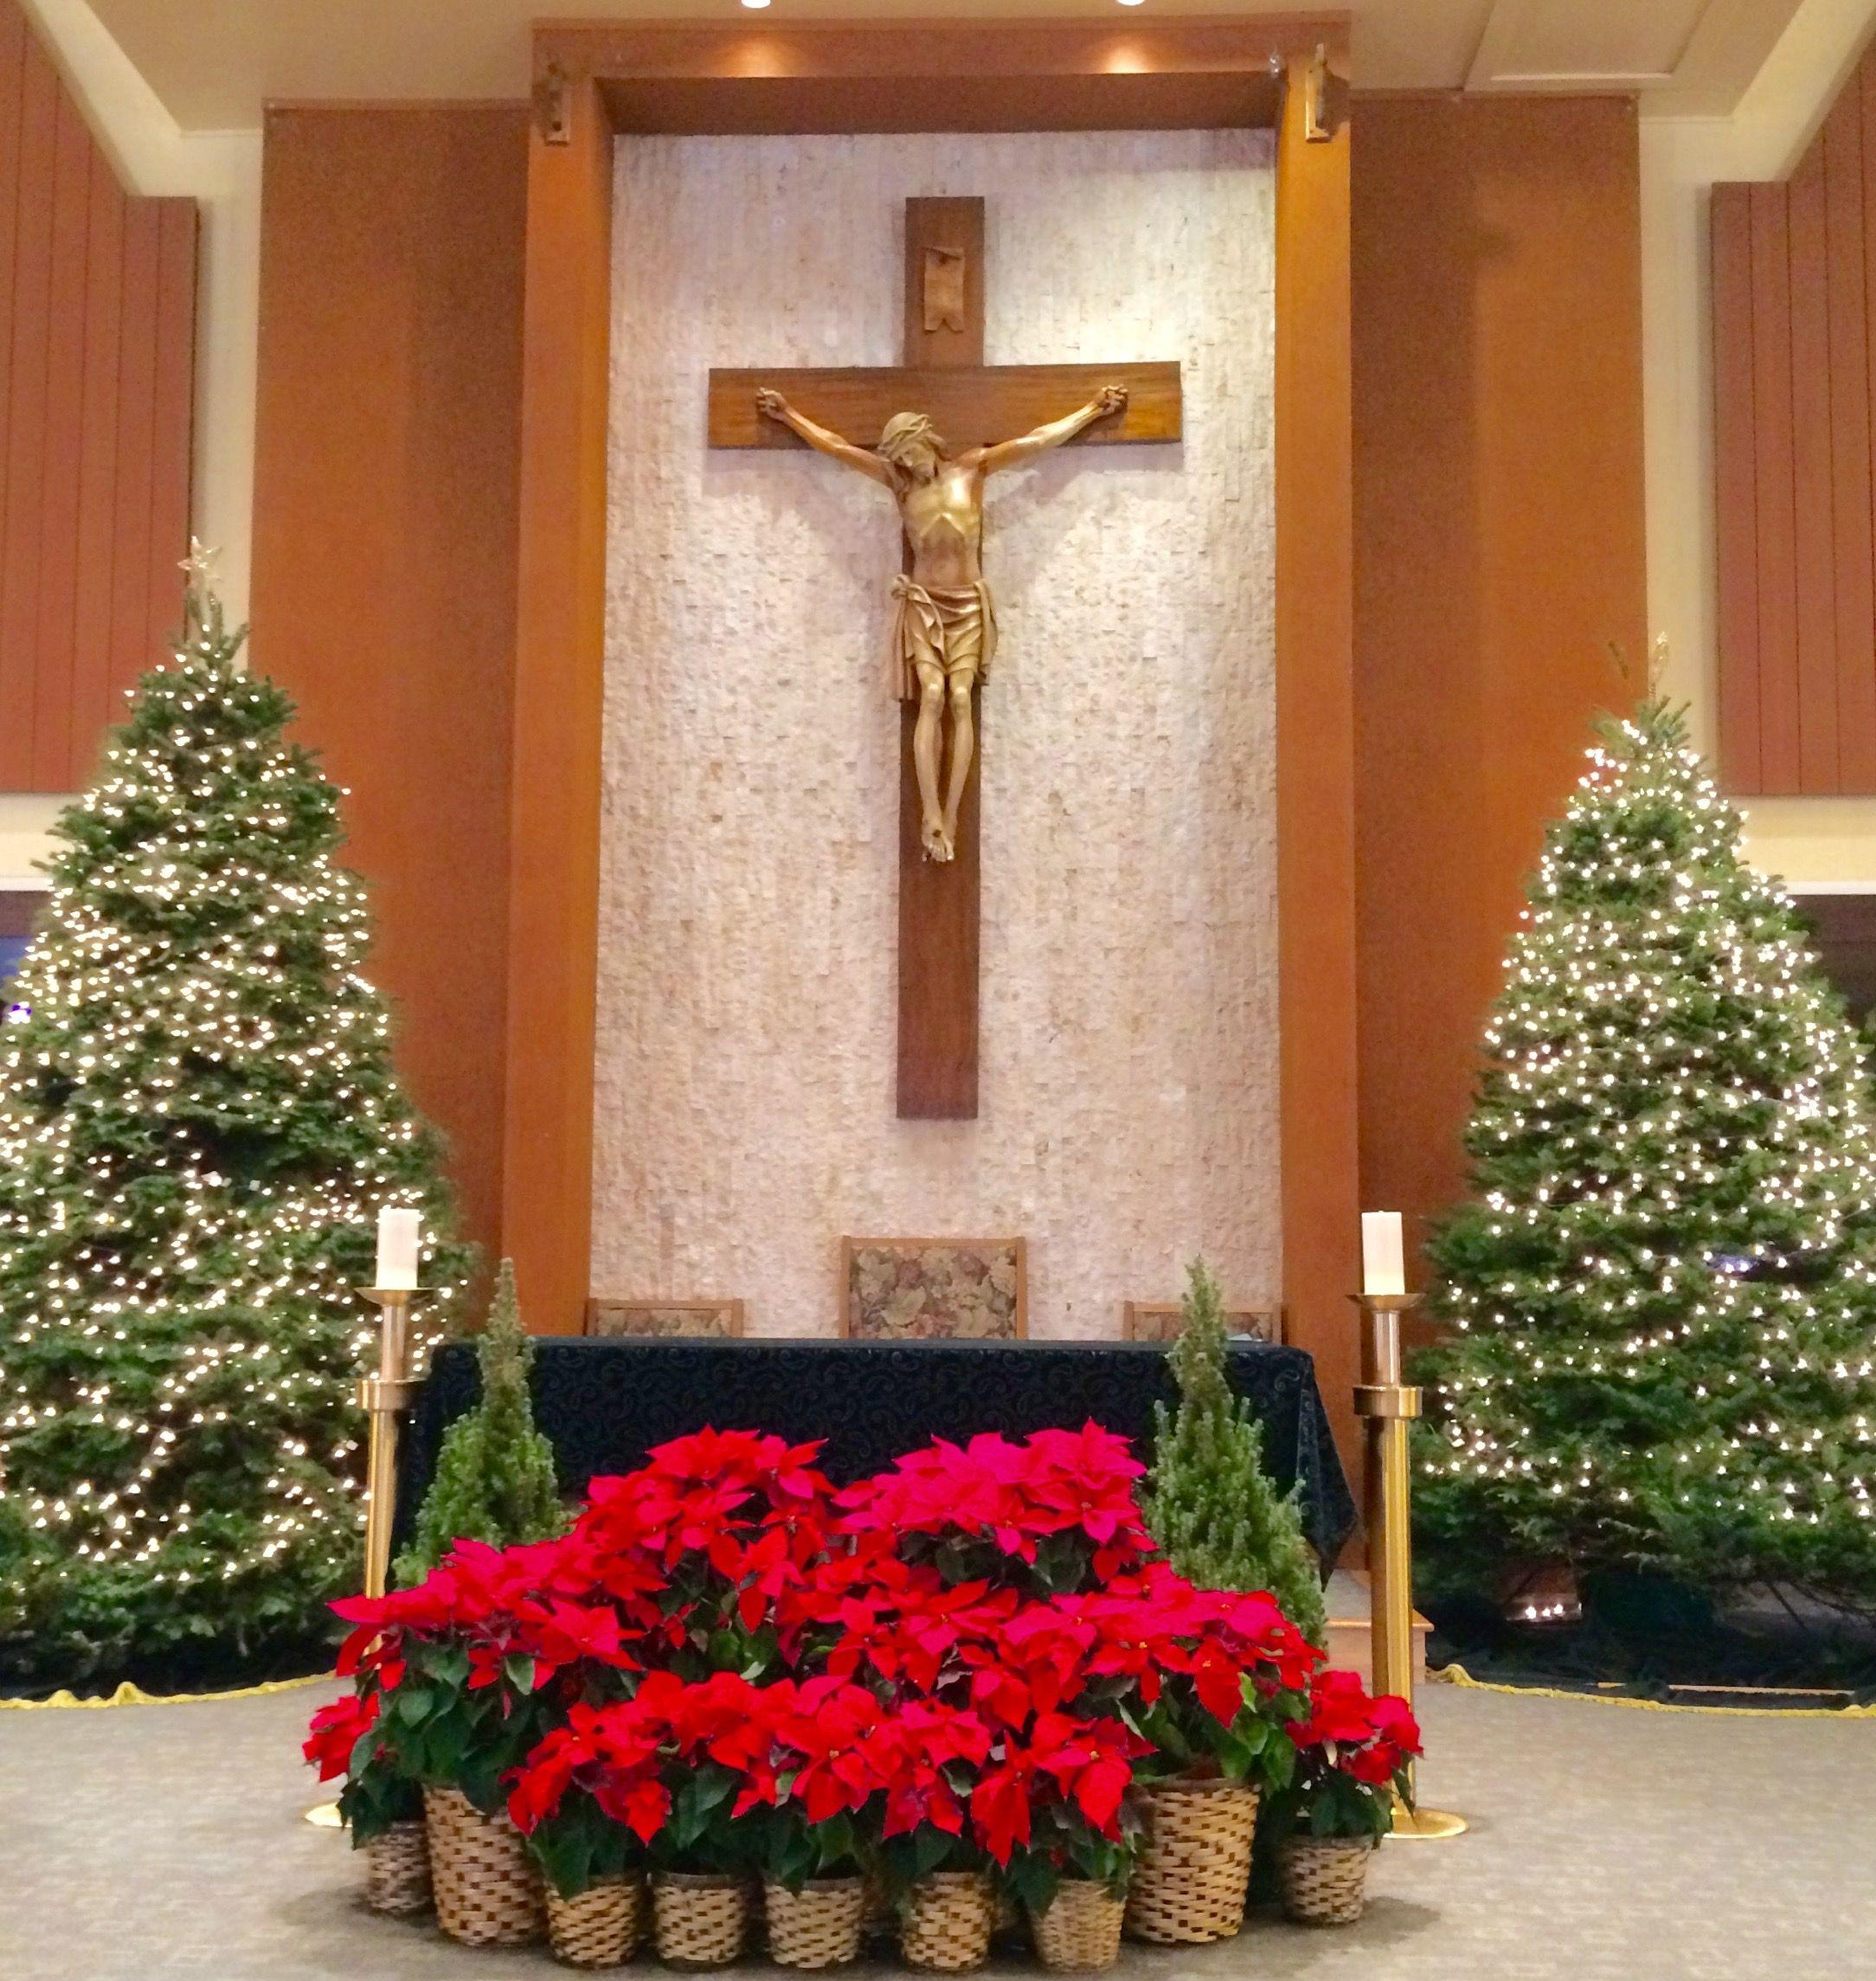 When Do You Take Down Christmas Decorations Catholic